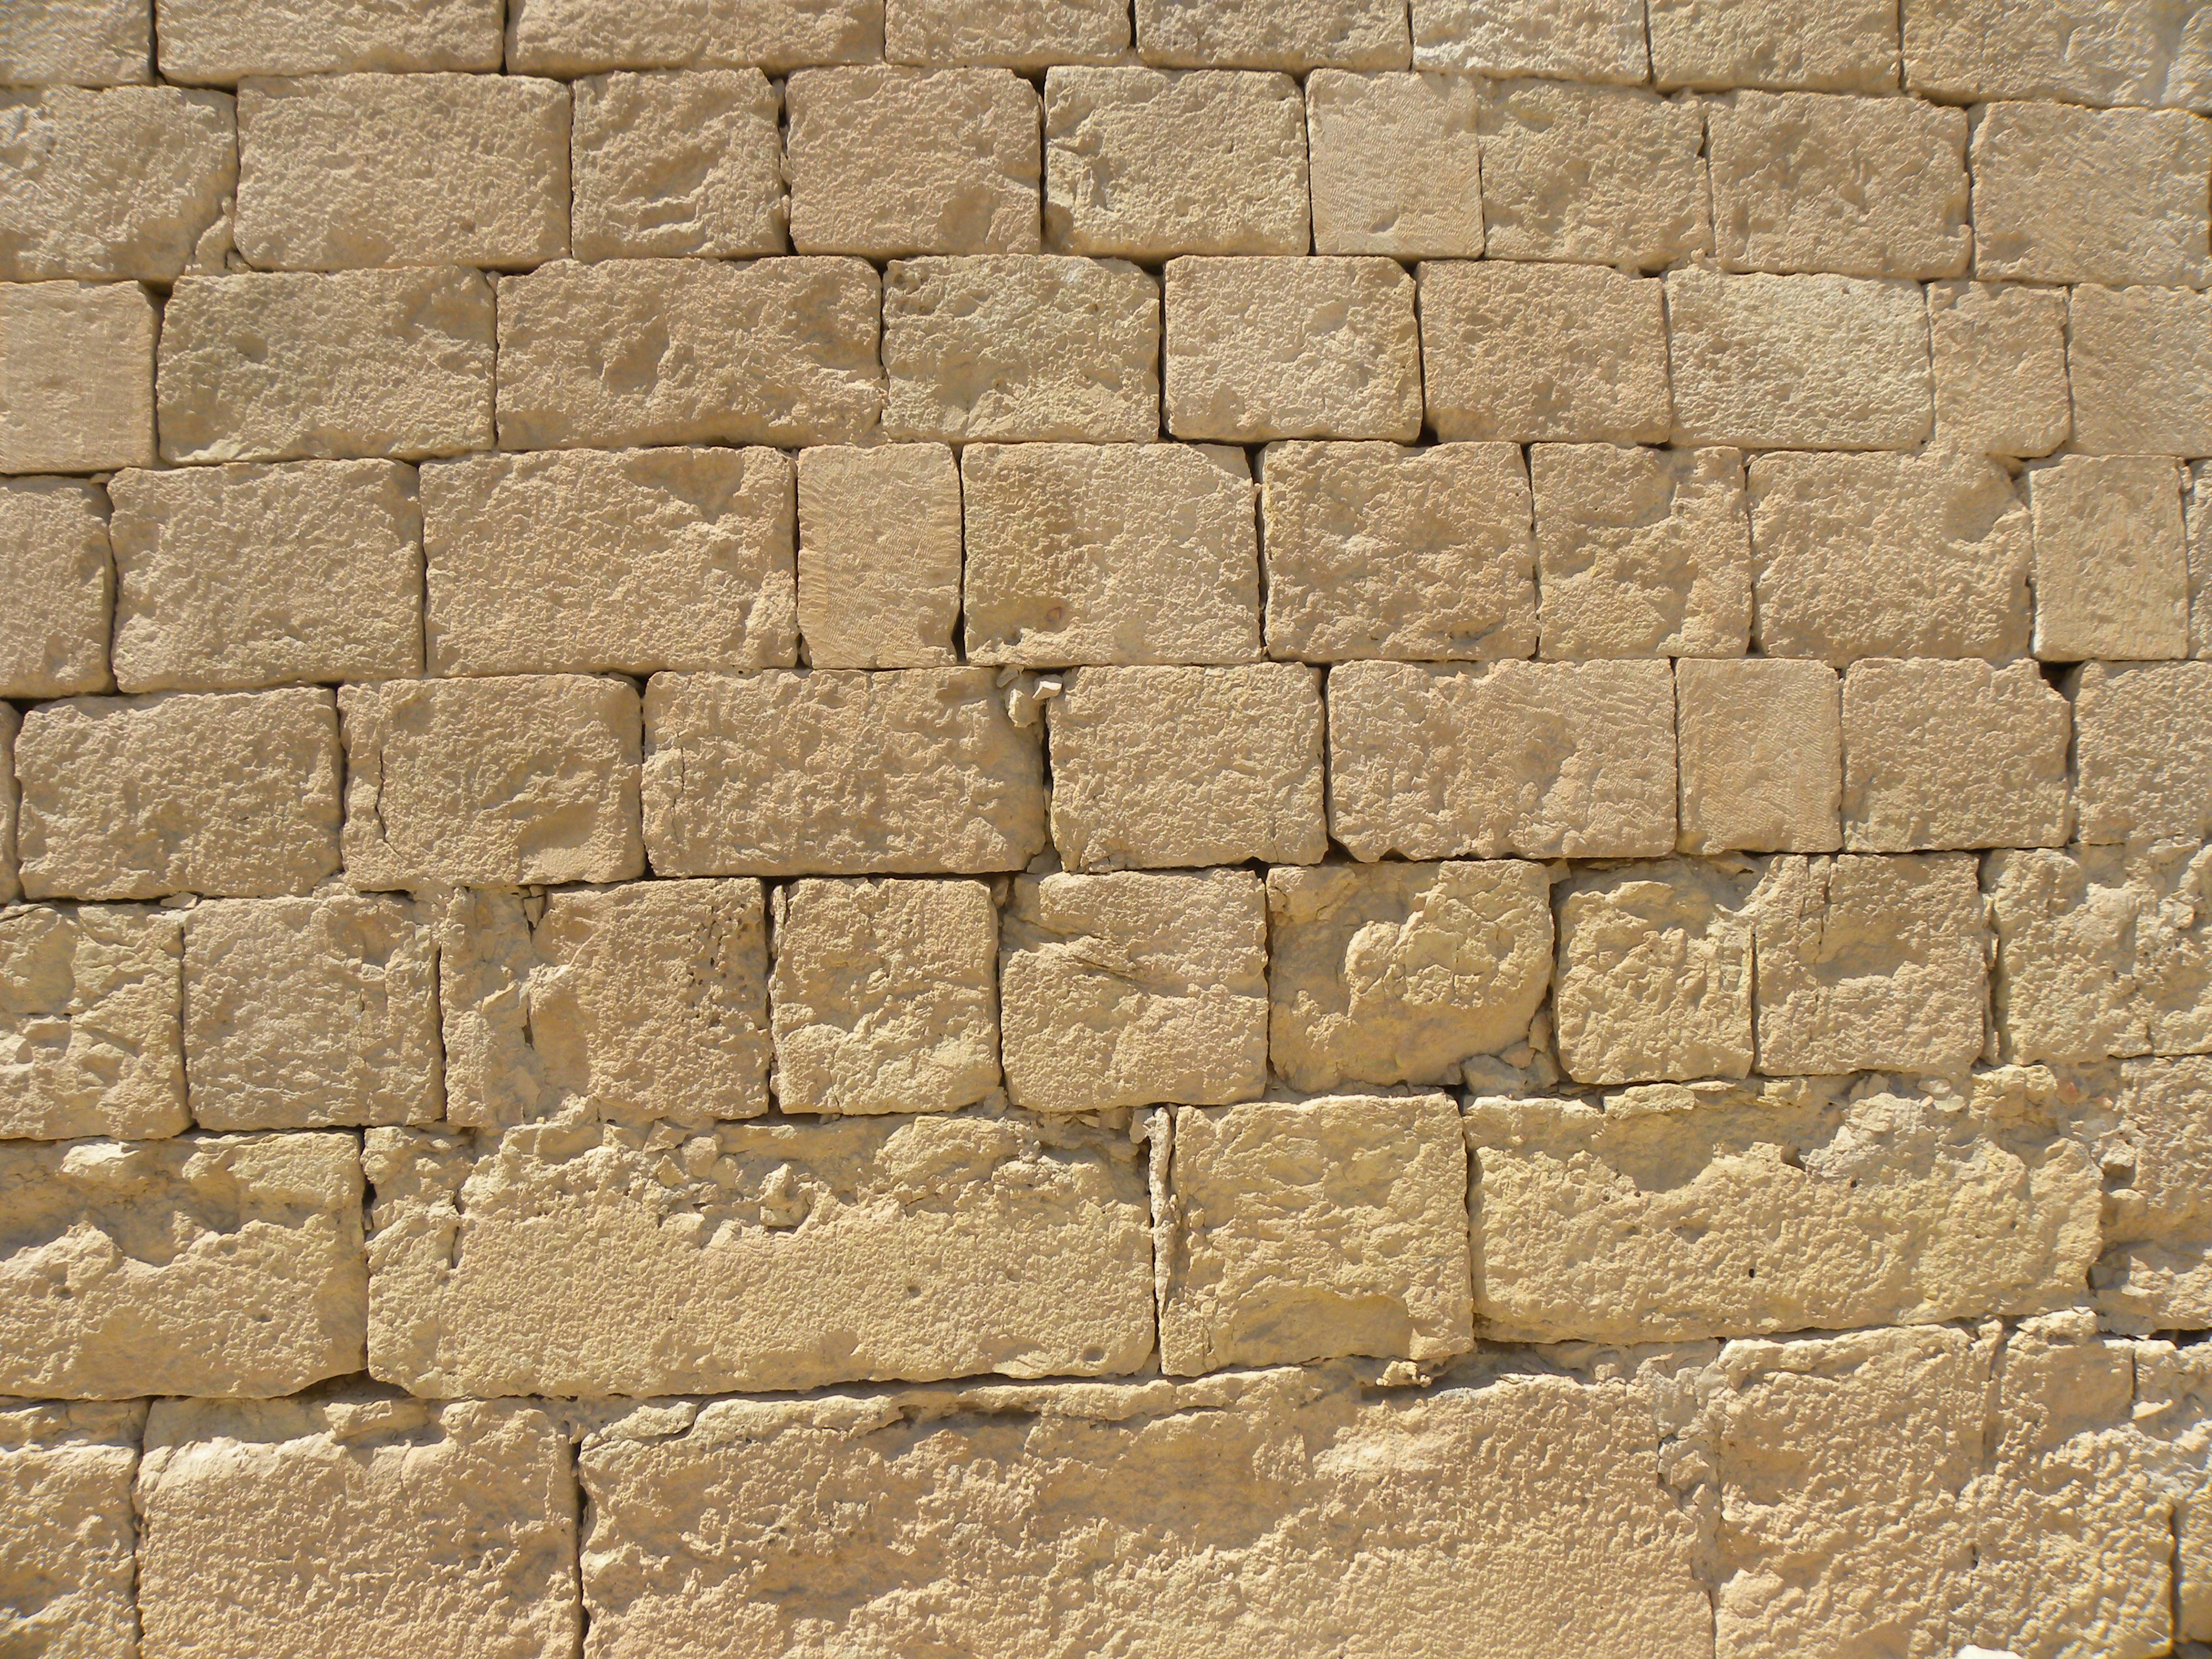 Dressed Stone Wall 2 A Roman Era Limestone Wall